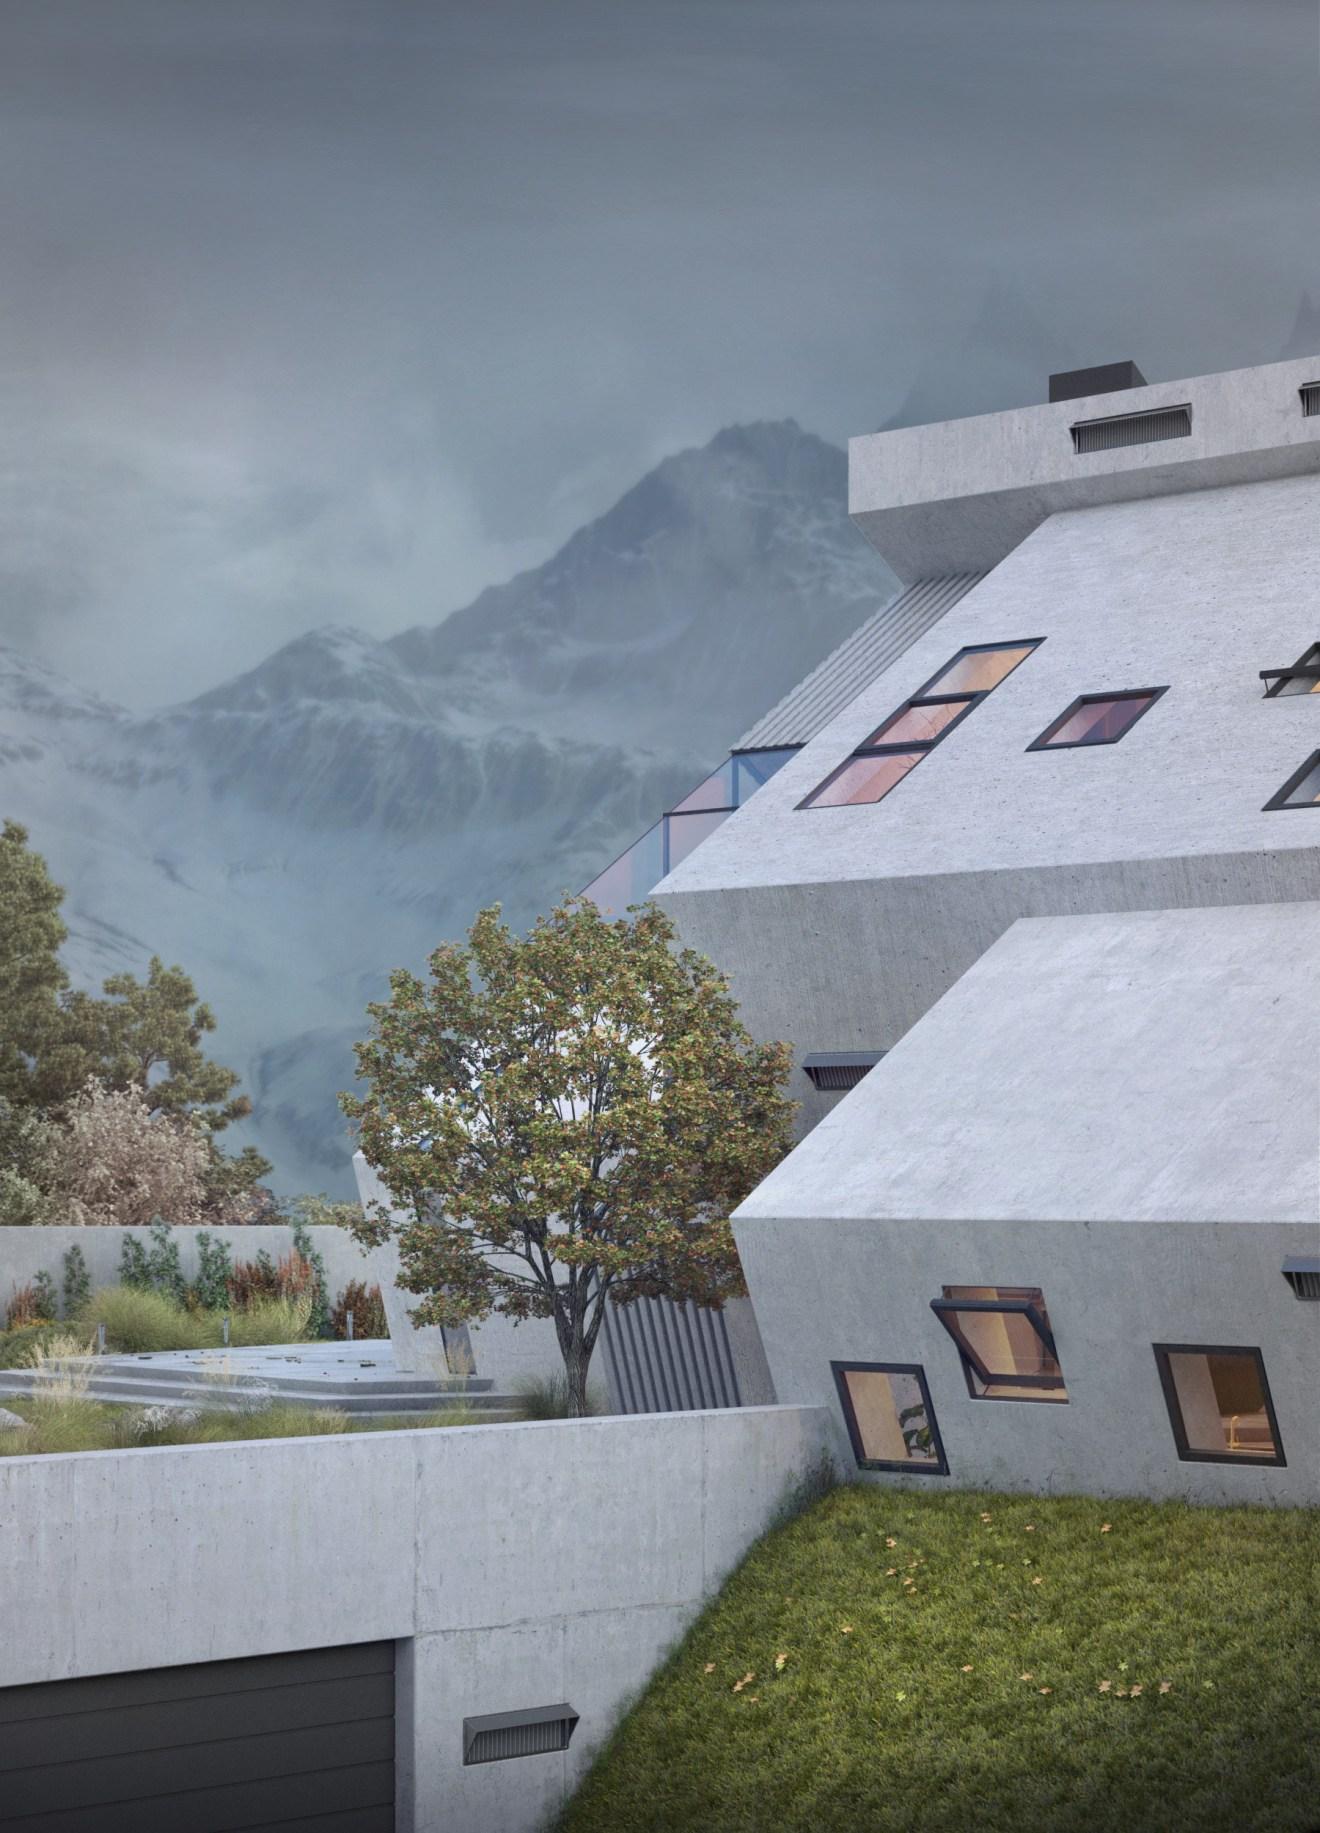 Pentahouse - dom inspirowany kształtem gór